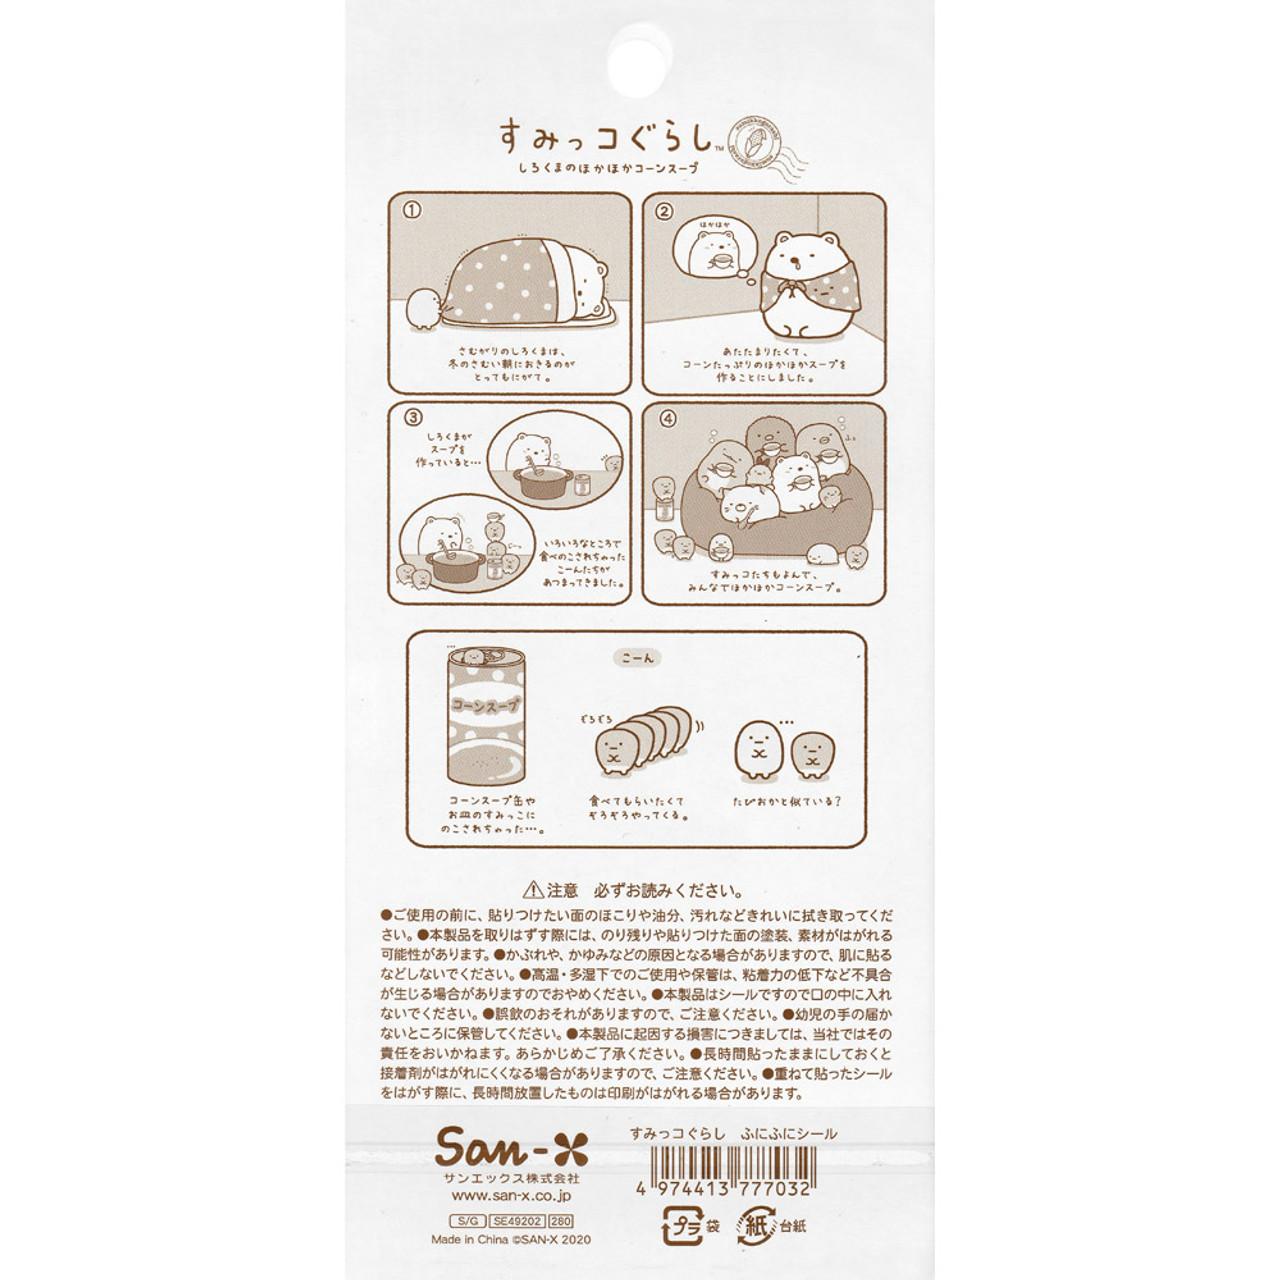 Sumikko Gurashi Funny Collection Sticker SE49202 - Drink ( Back View )